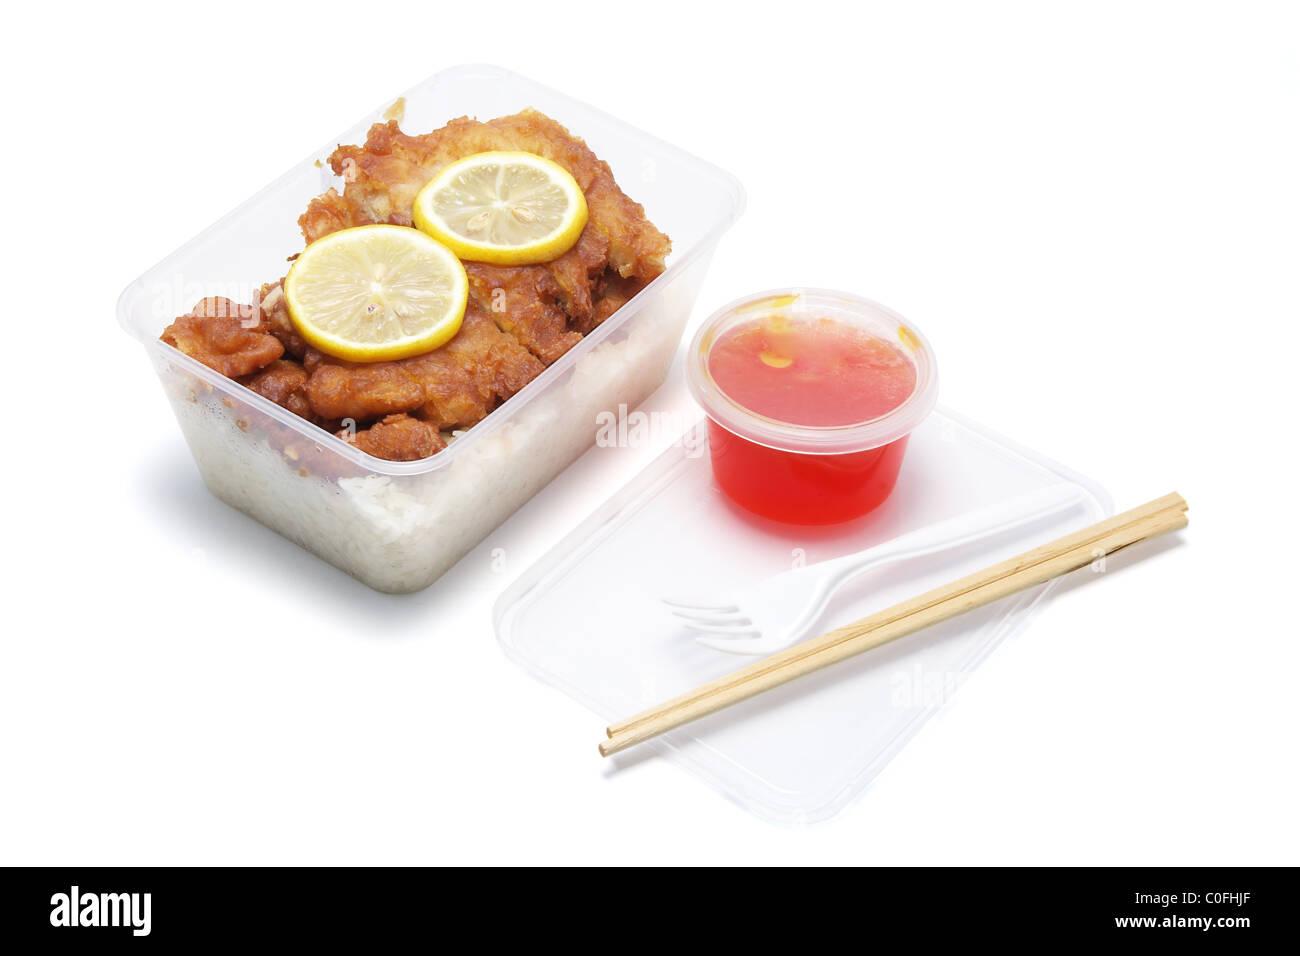 Chinese Takeaway Food - Stock Image